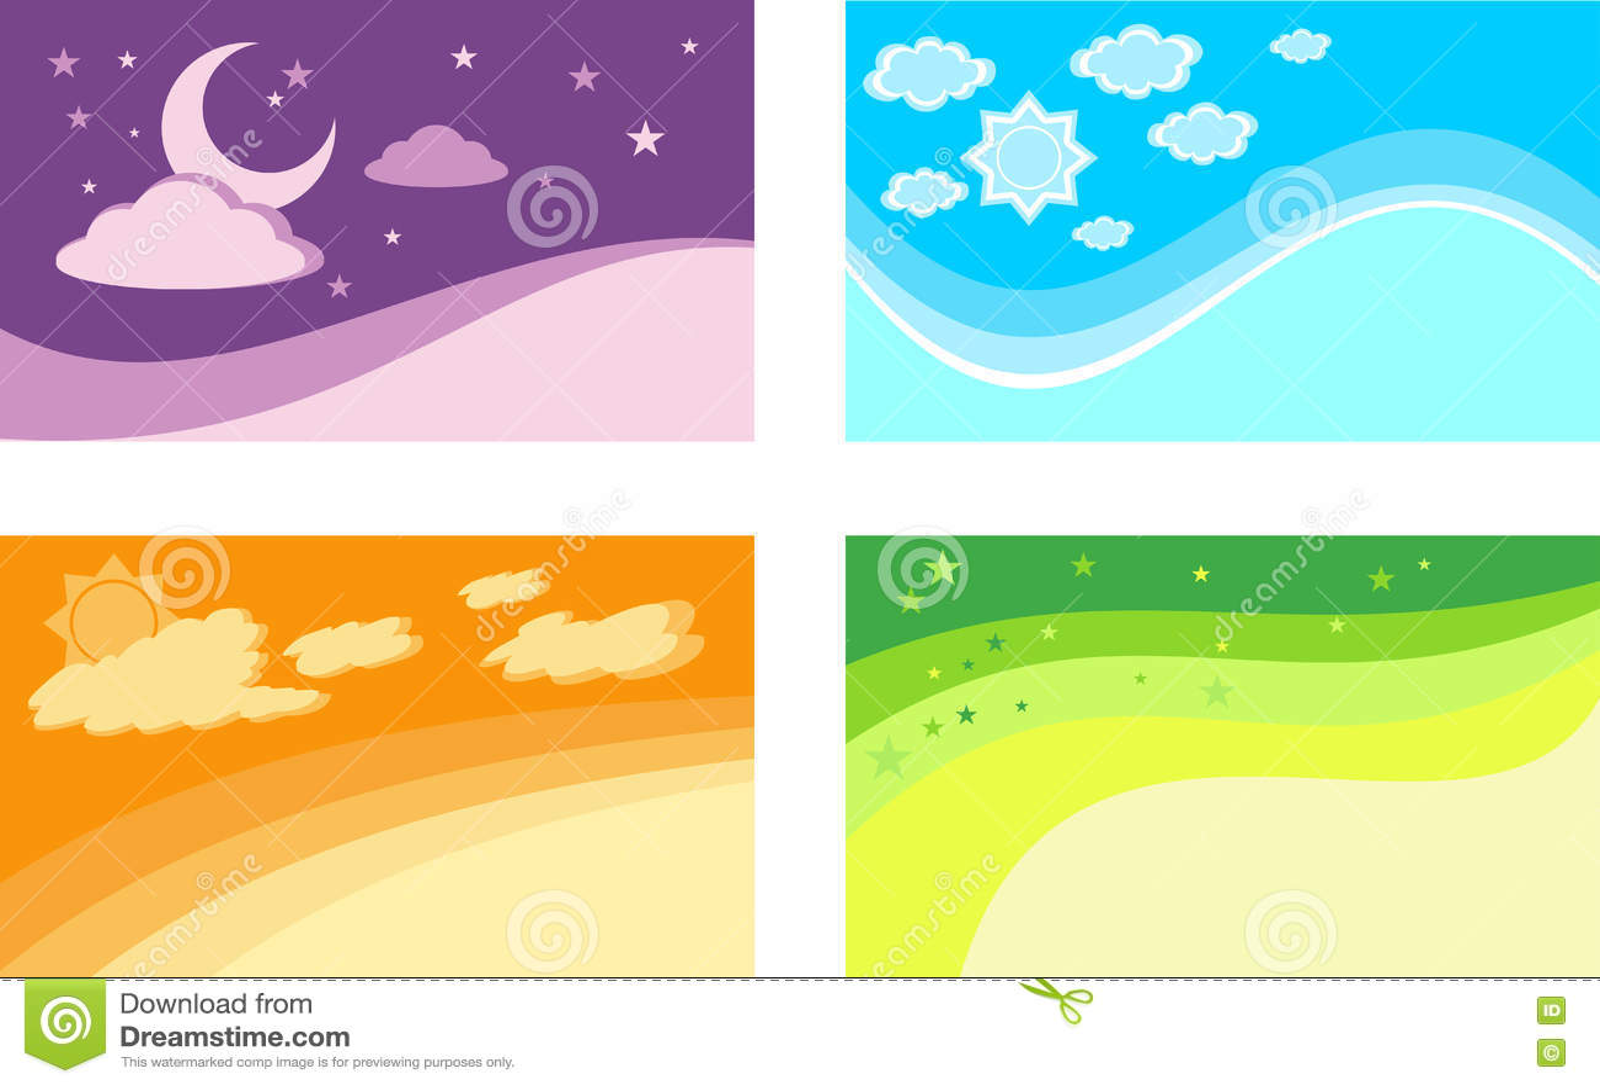 Fondos para tarjetas illustrator